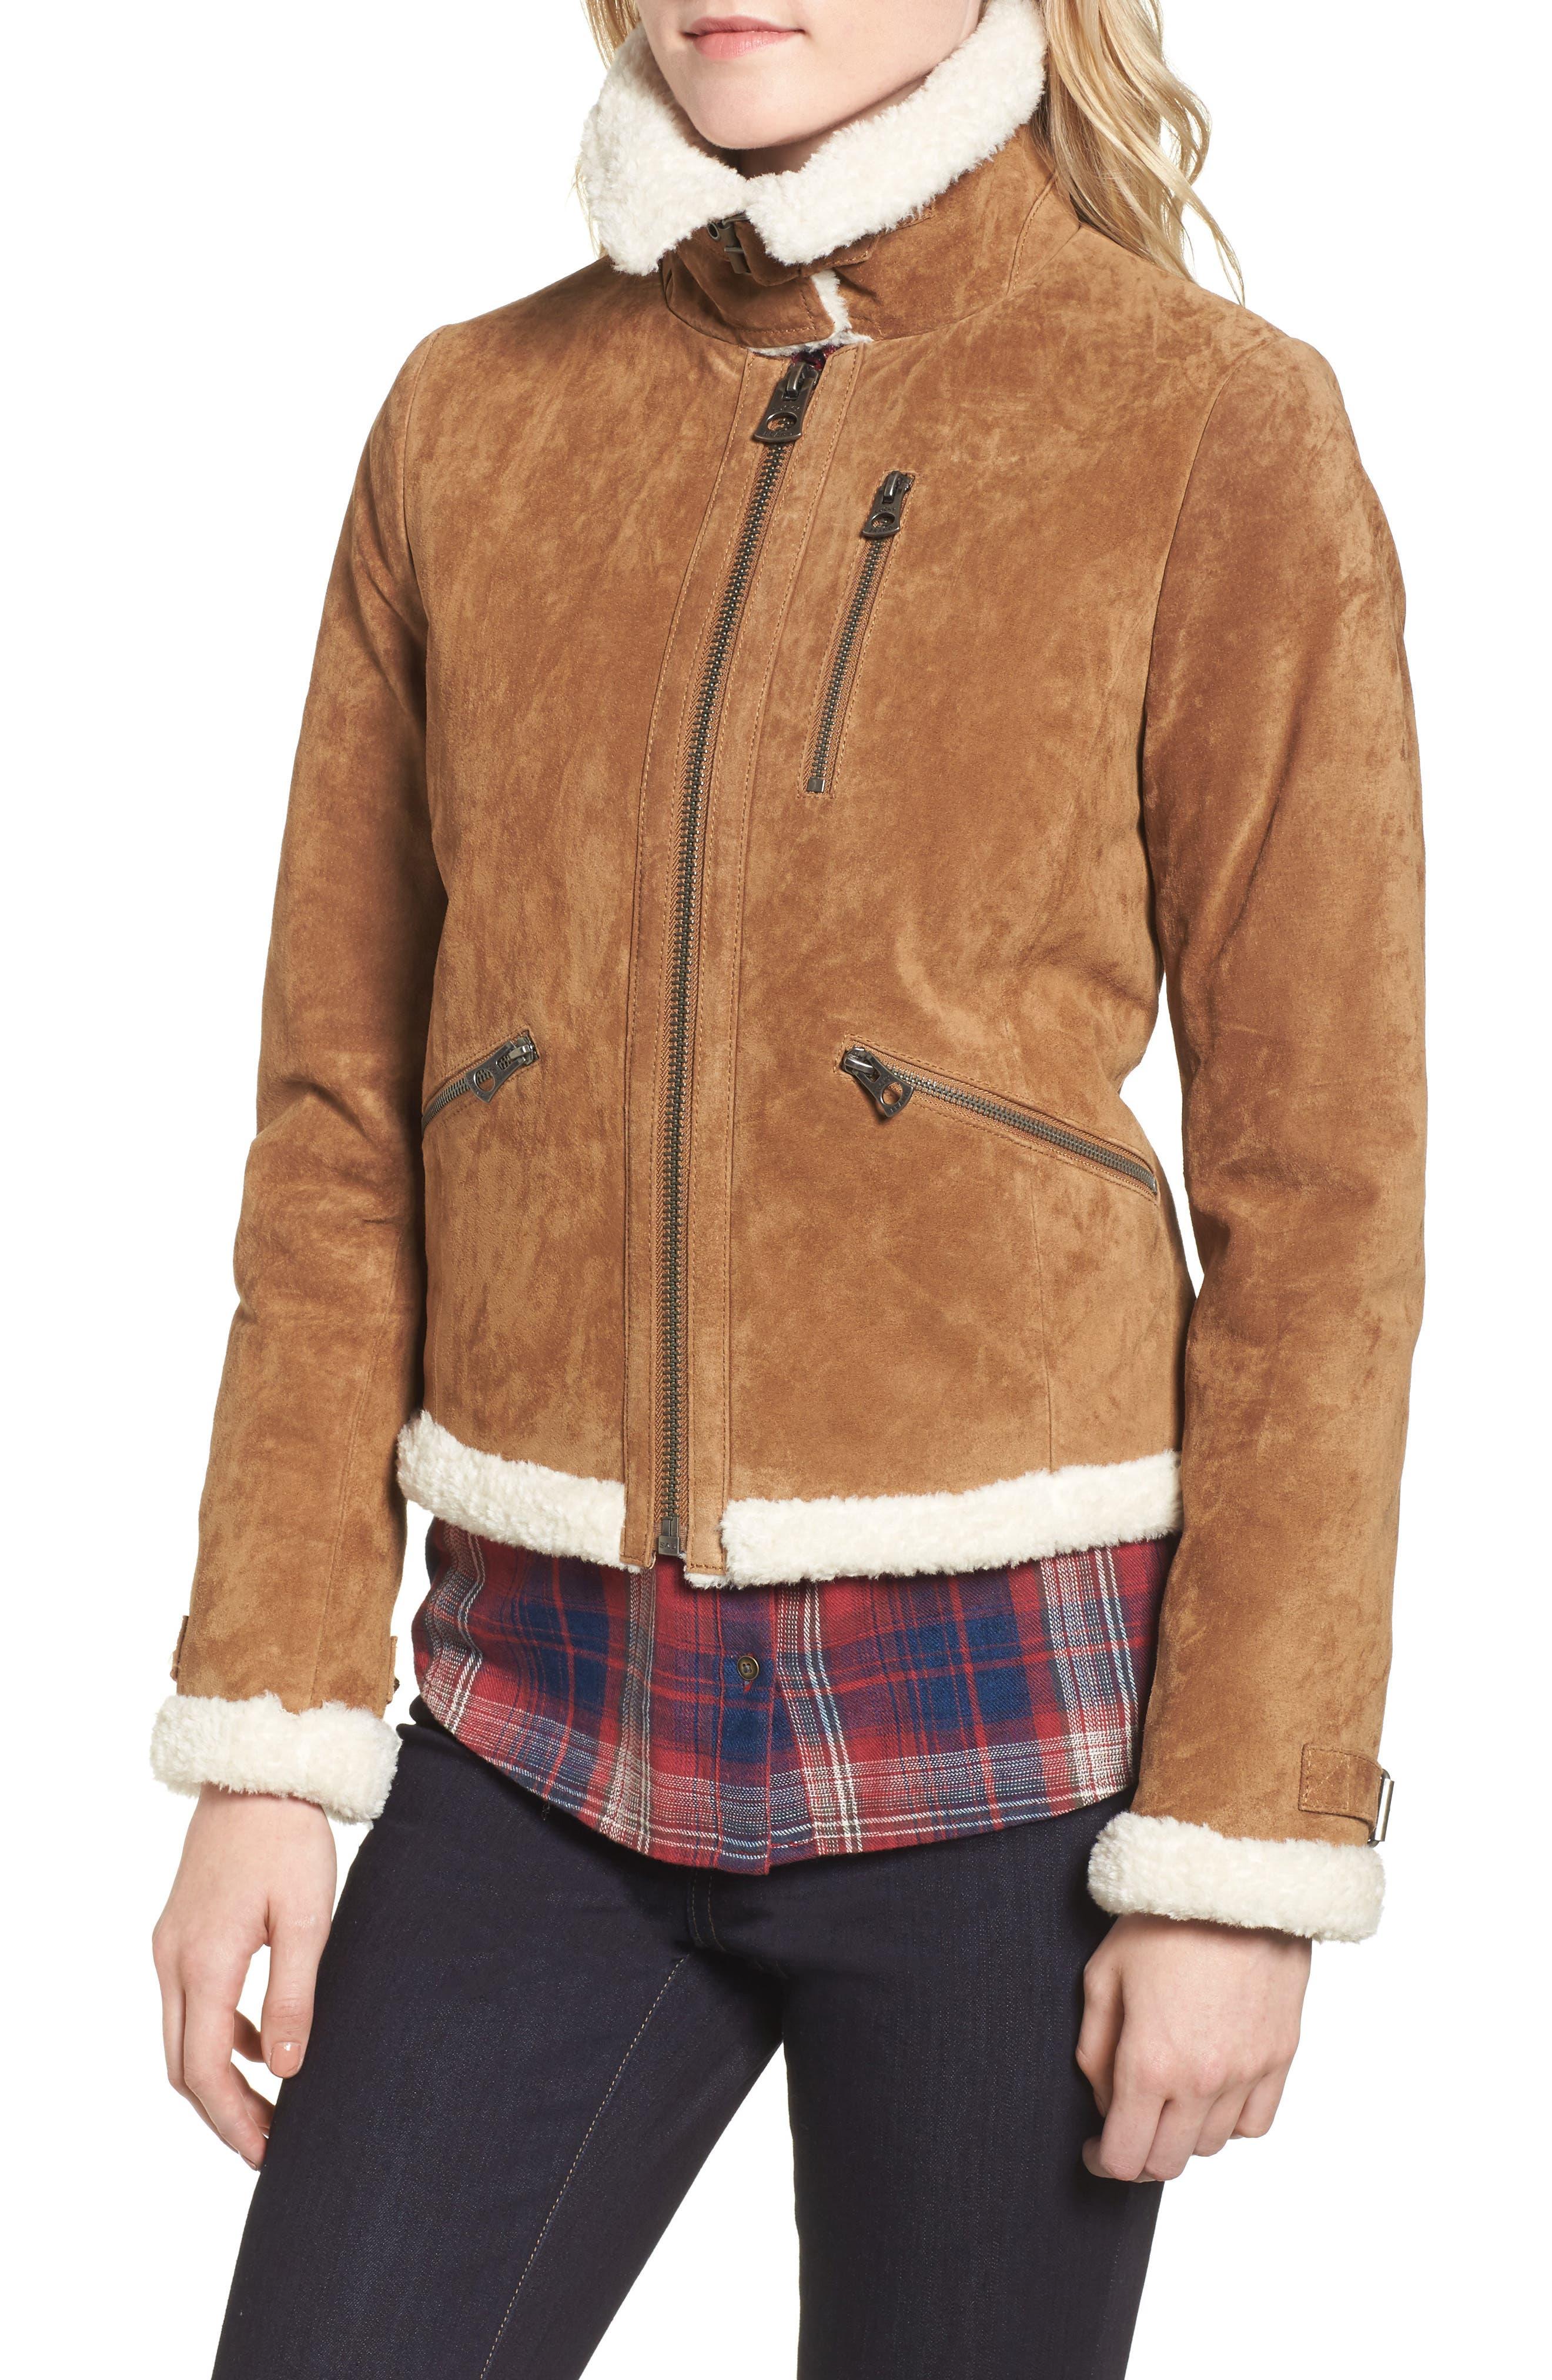 Leather Jacket with Faux Fur Trim,                             Alternate thumbnail 4, color,                             Chestnut